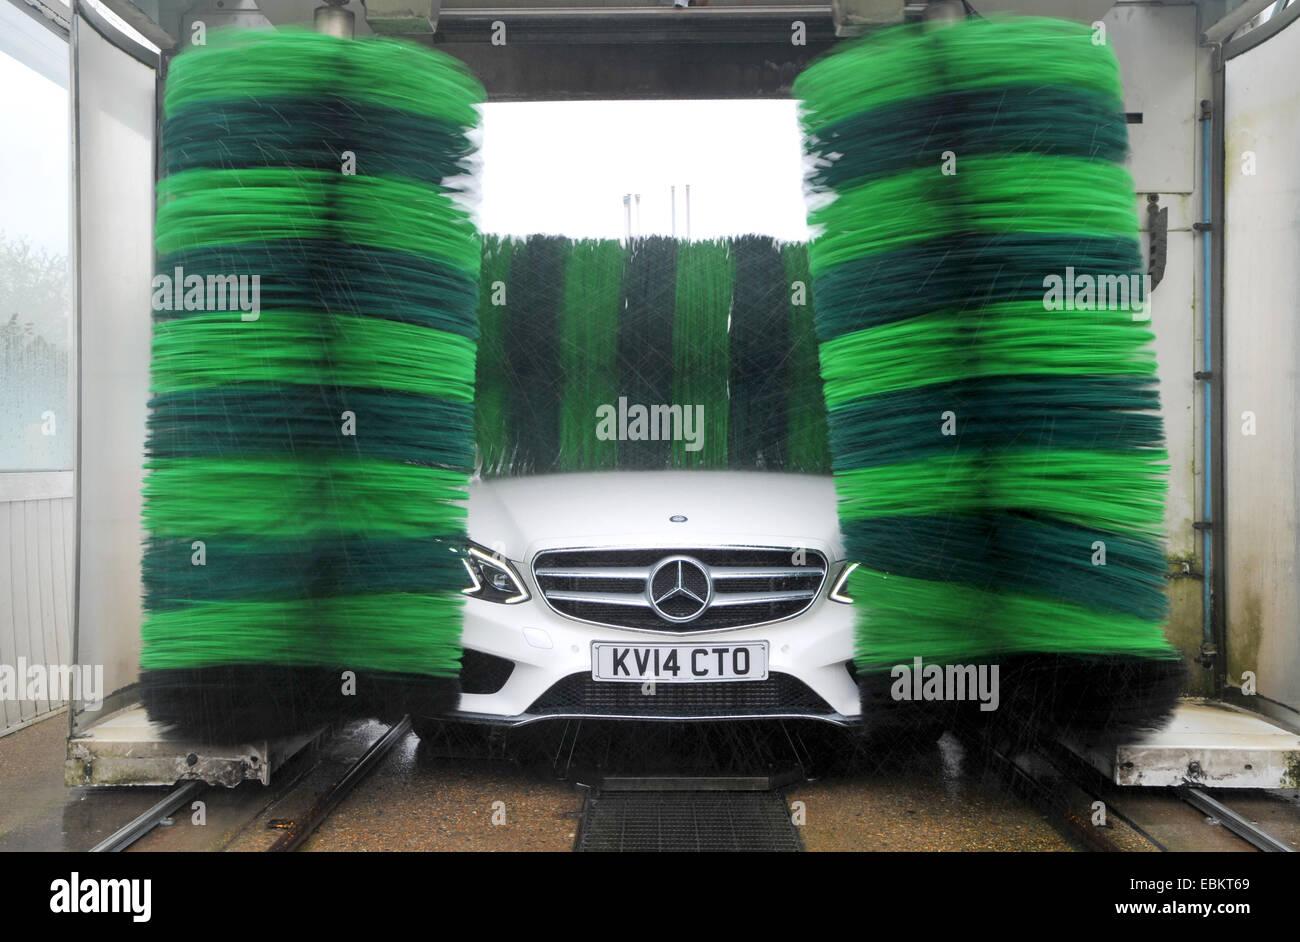 Mercedes e class car going through a car wash stock photo for Mercedes benz car wash free